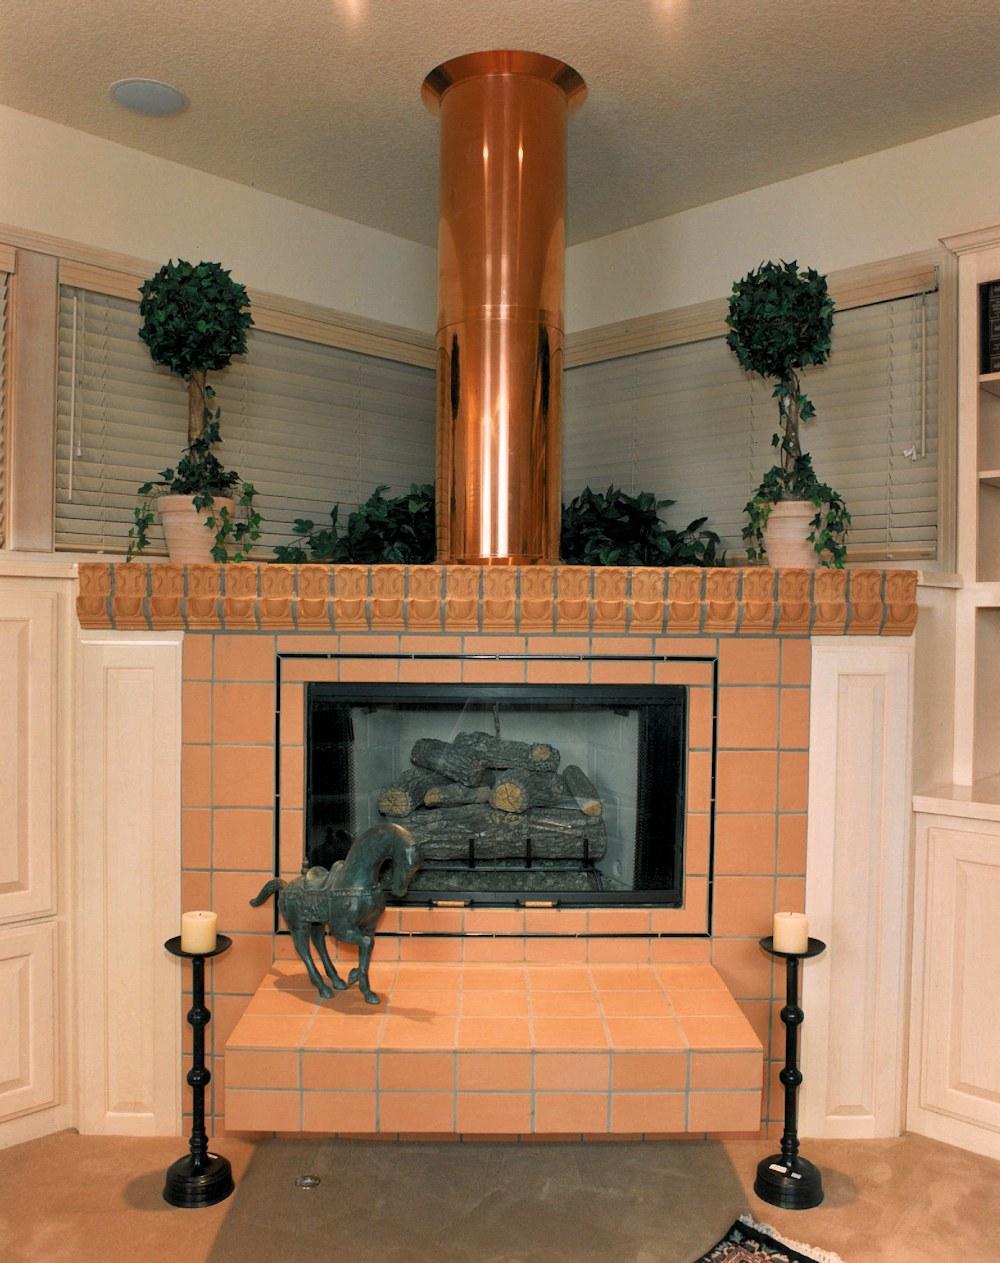 Oregon Jewel 1994 - copper chimney flue in family room - Bernard Custom Homes - Street of Dreams.